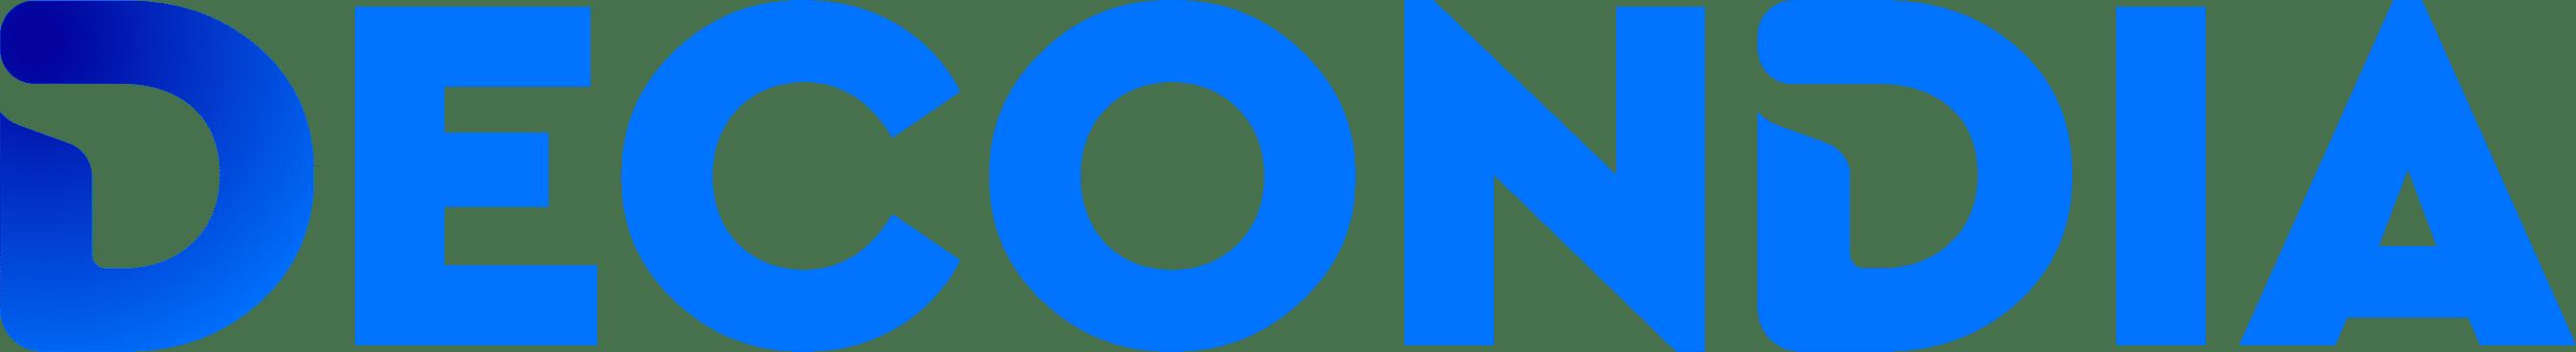 decondia-logo-wortbildmarke